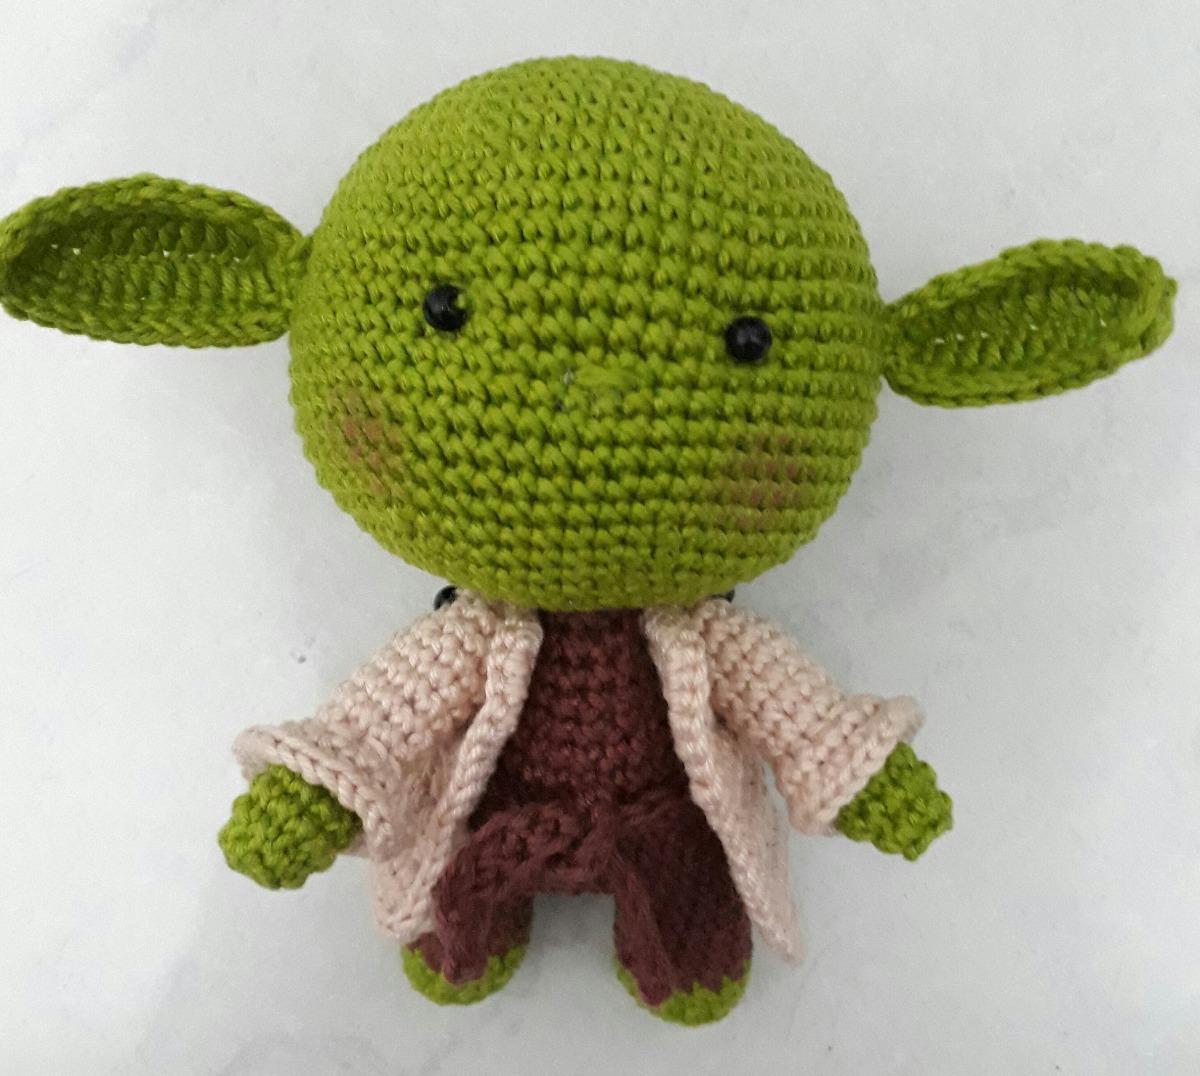 Receita Amigurumi Star Wars - Amigurumi Yoda de Crochê (Inspiração ...   1076x1200